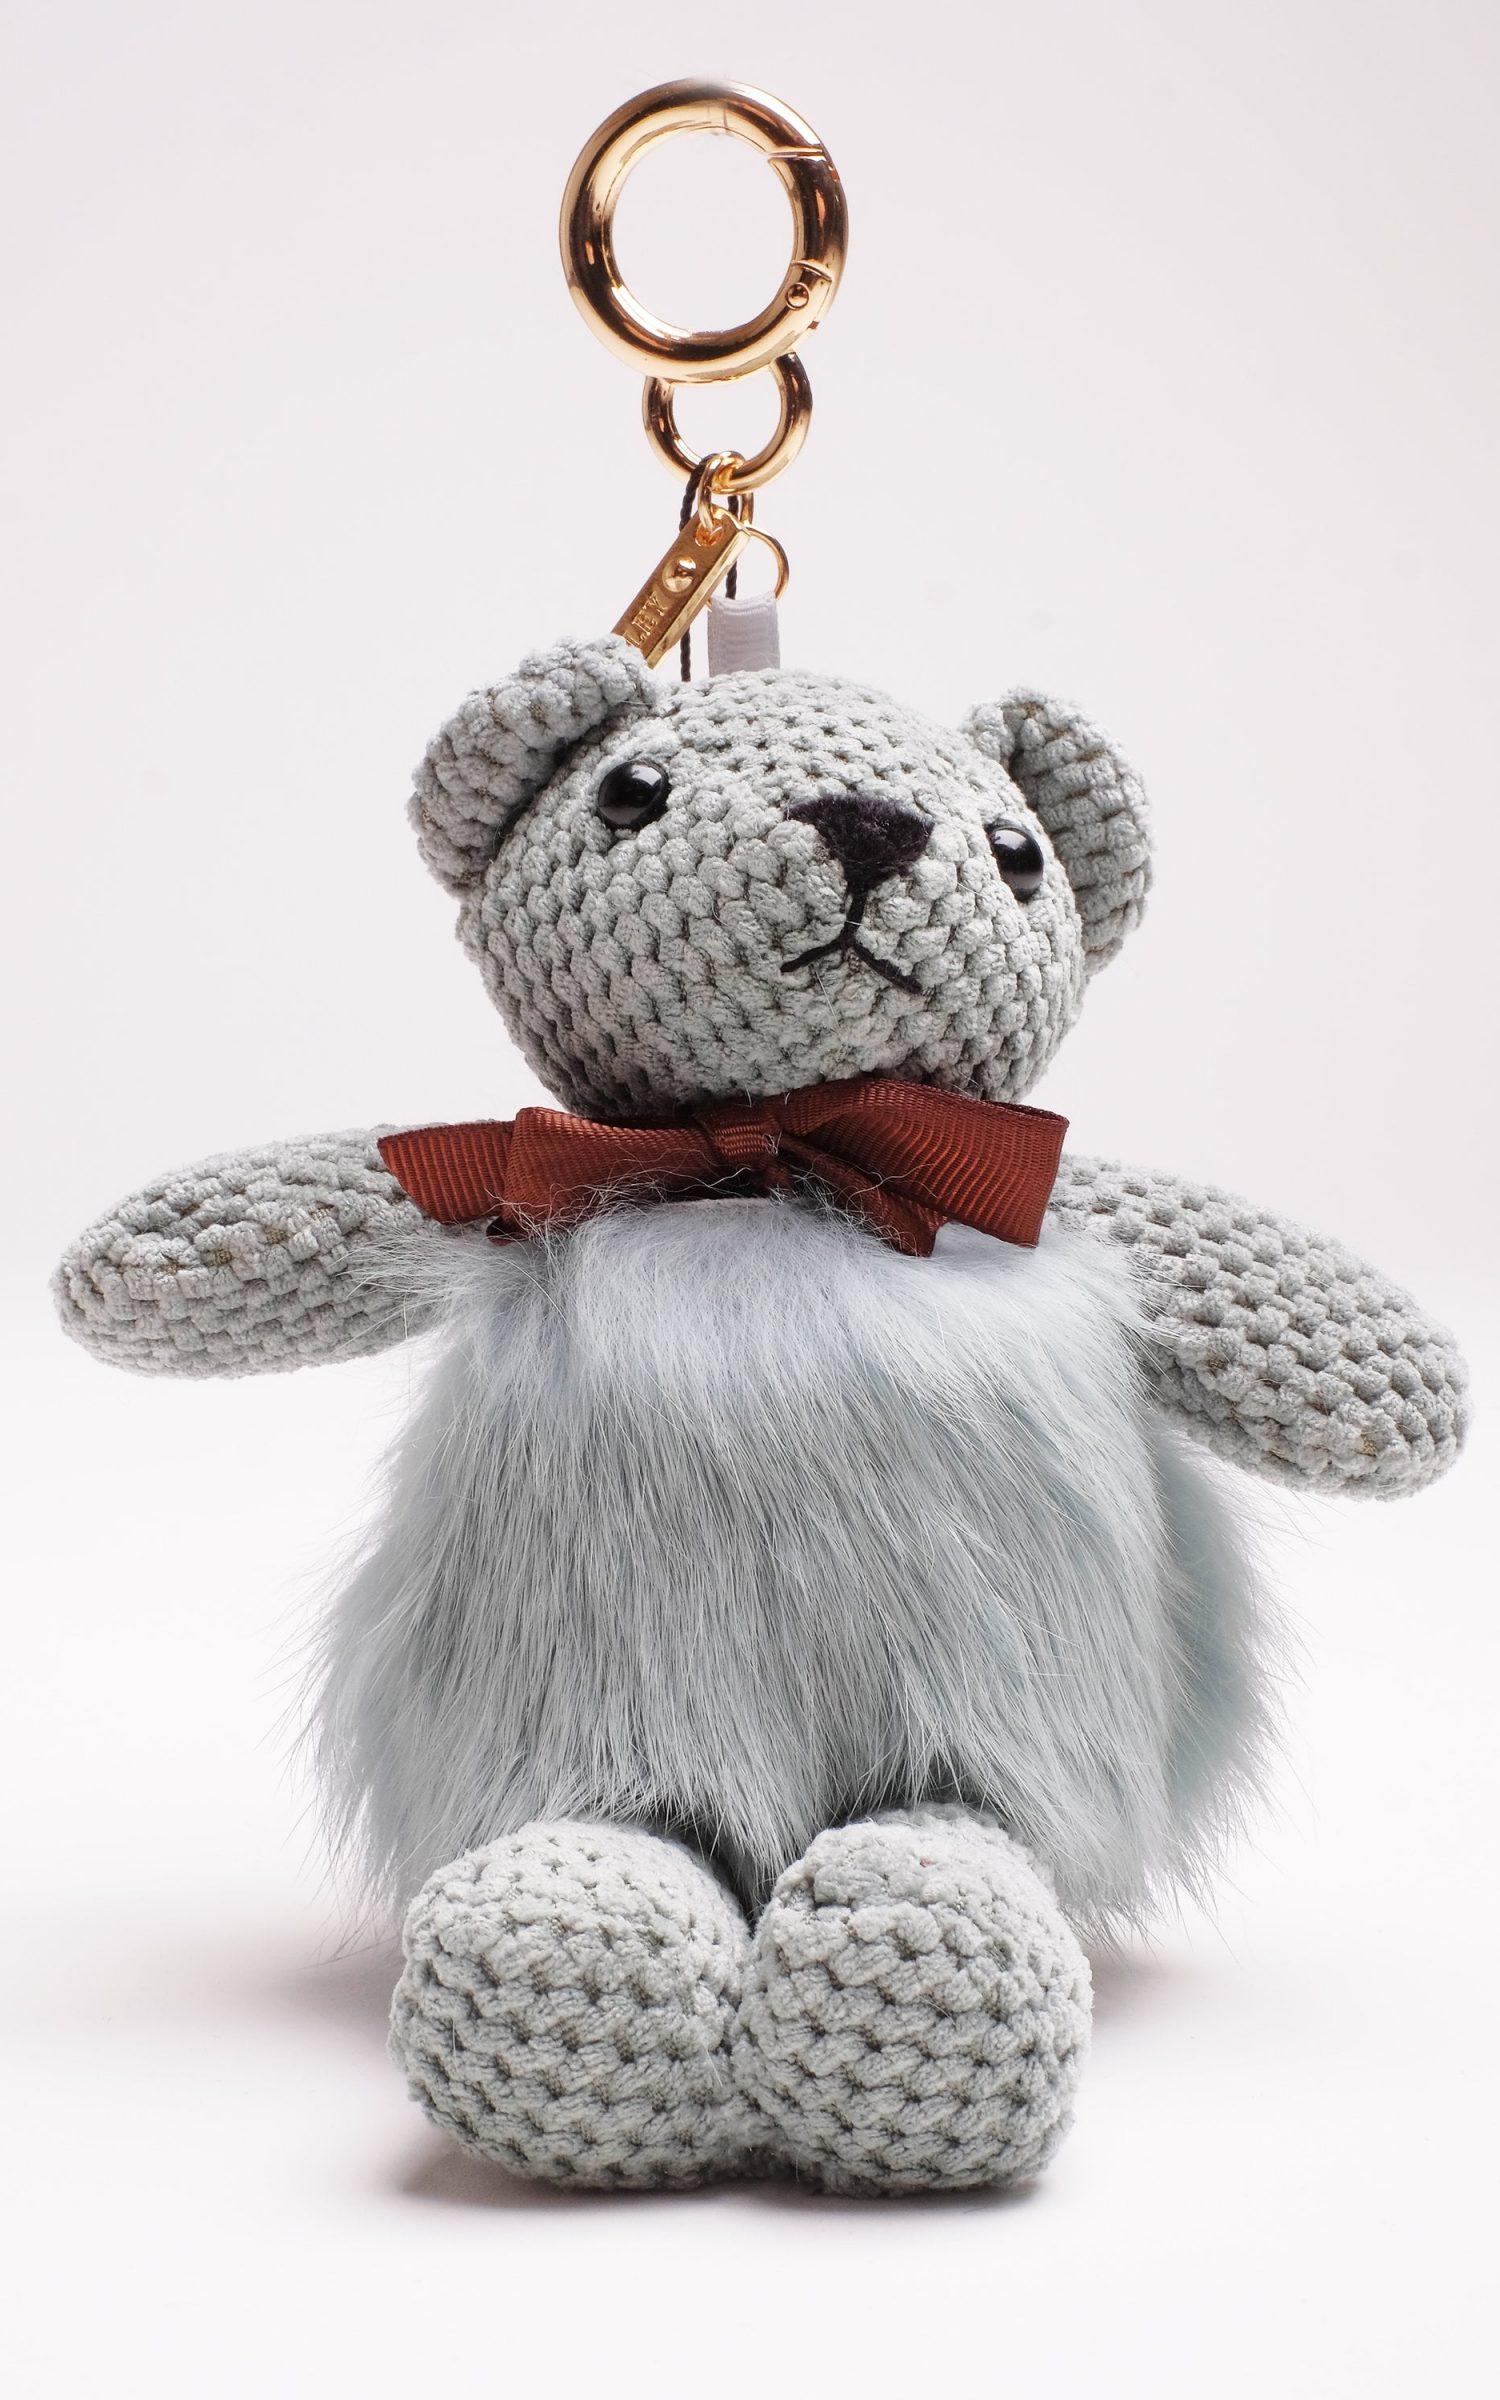 jayley-teddy-bear-p1037-21304_zoom